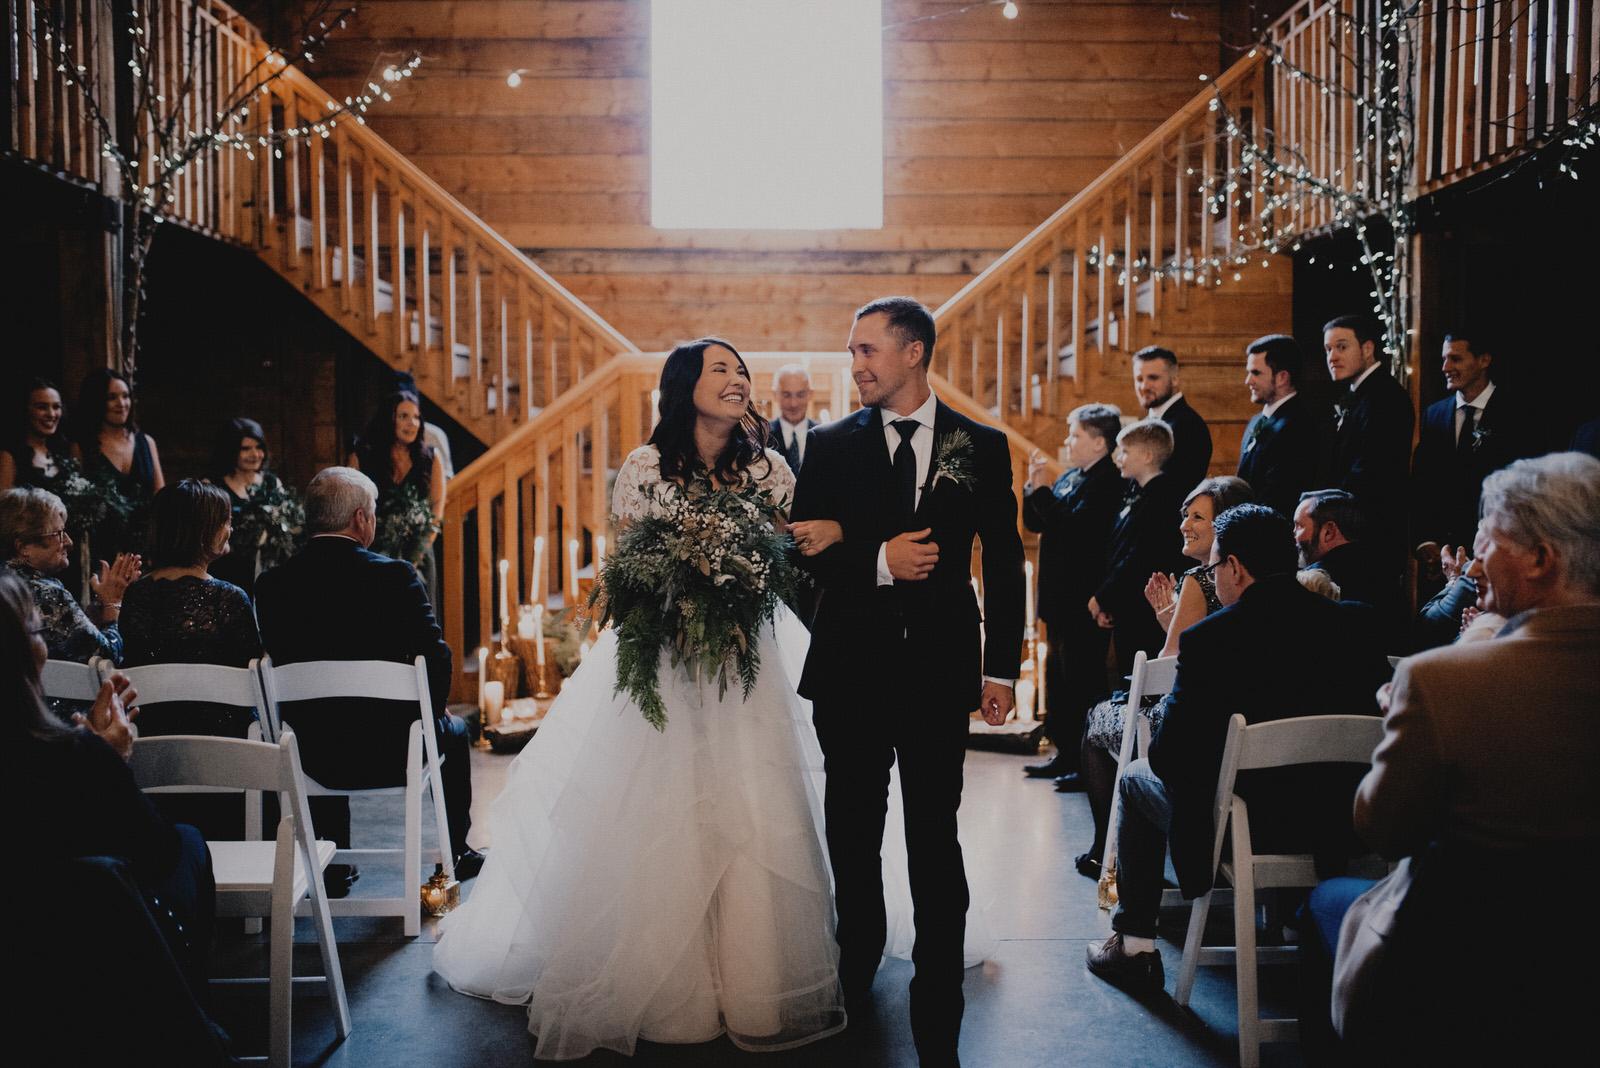 layersphoto_Fayetteville Wedding Florist_217.jpg